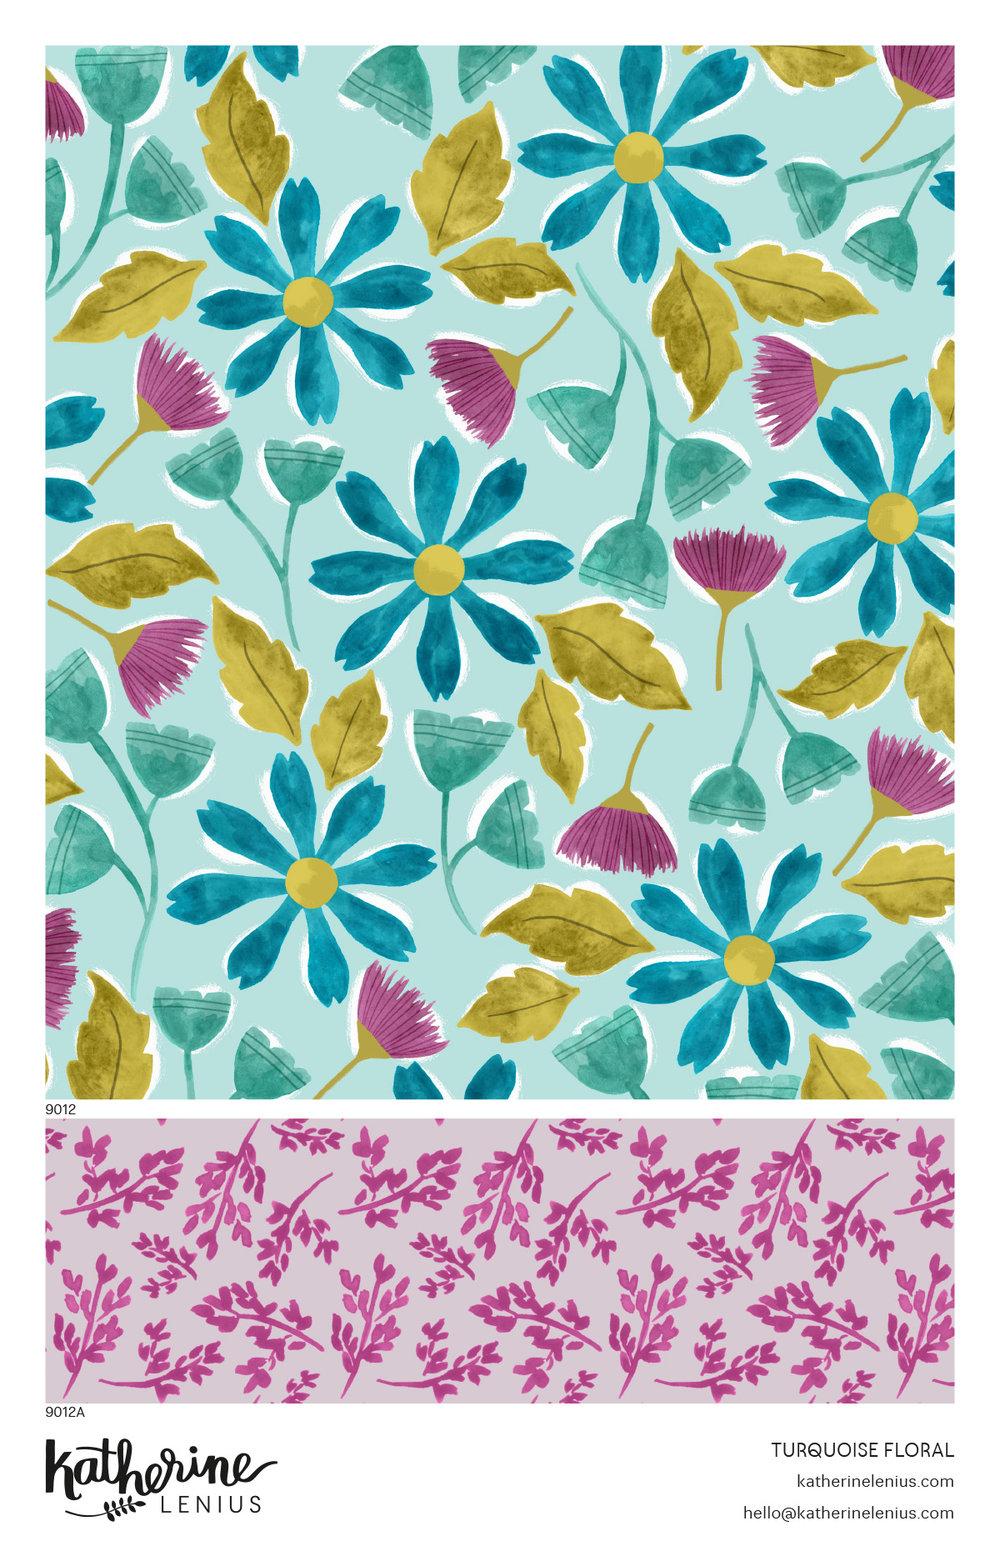 KL_9012_Turquoise Floral copy.jpg